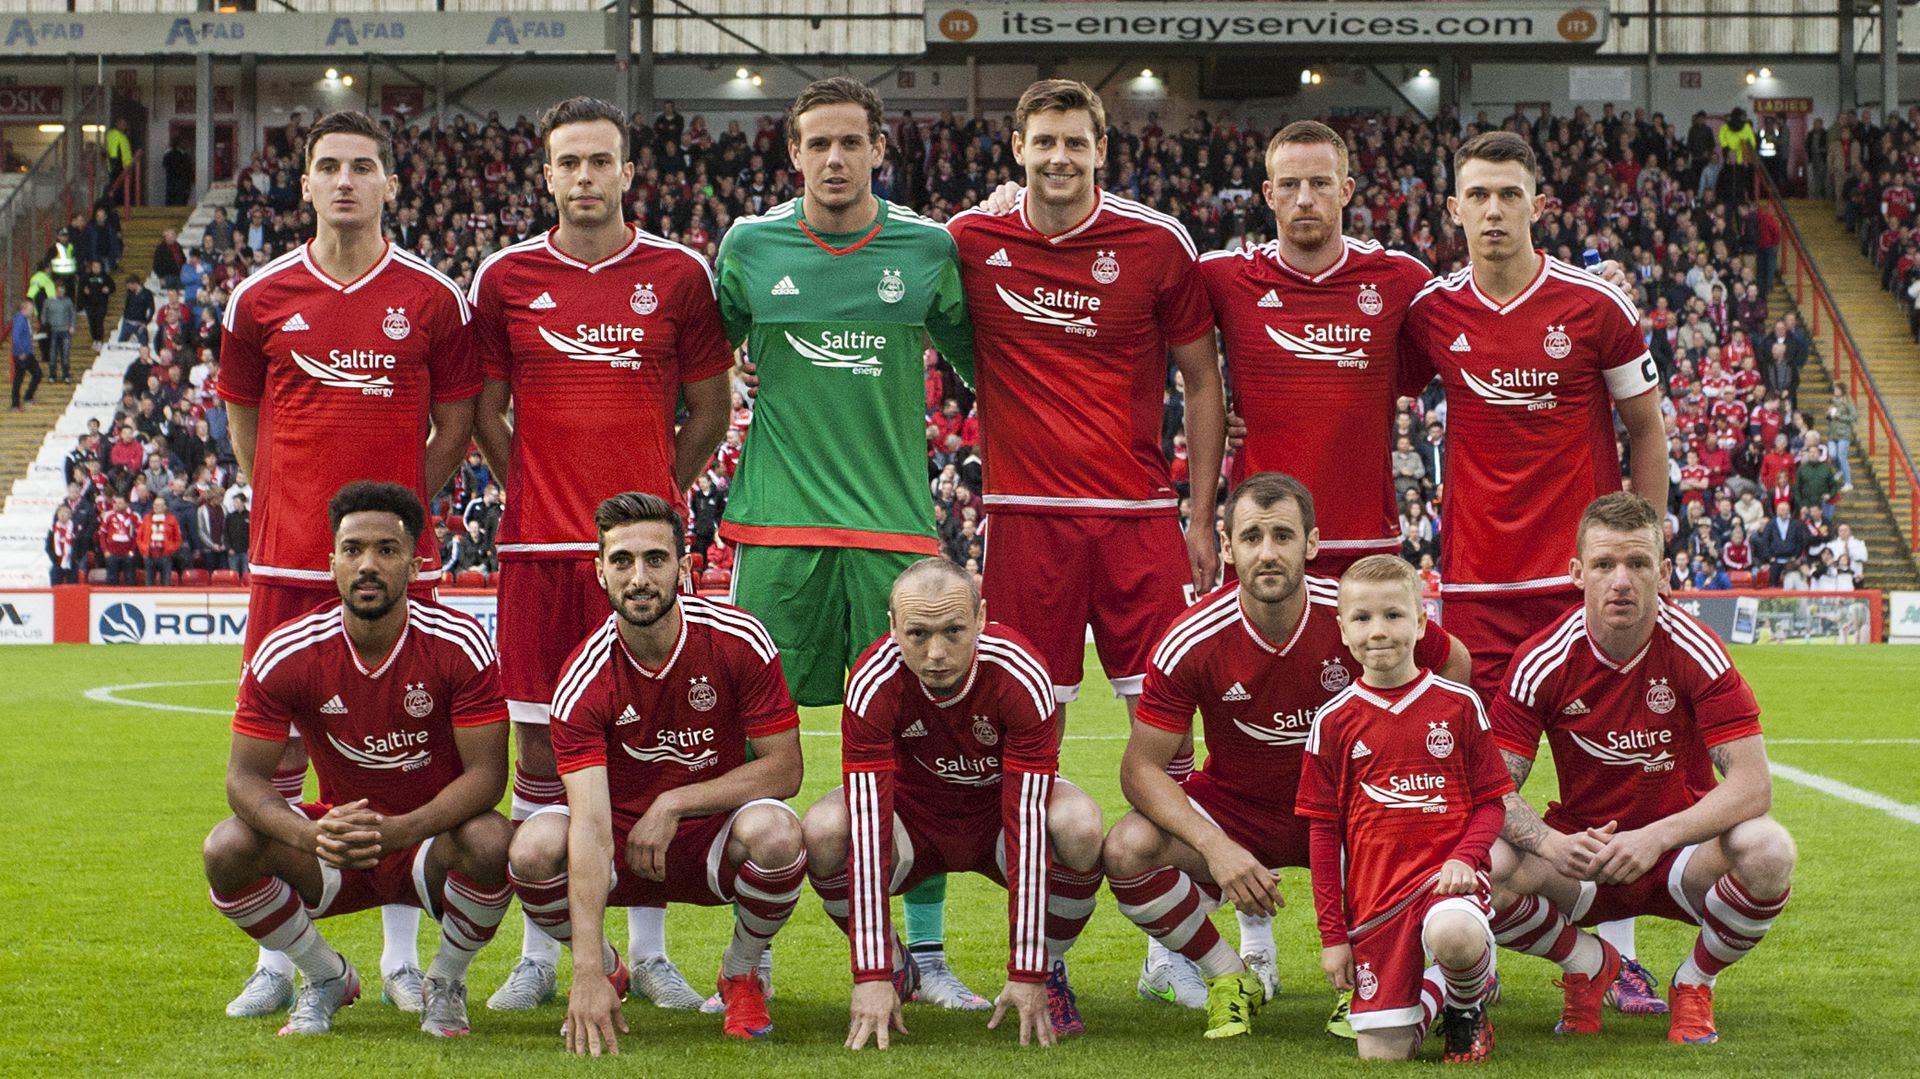 Shkendija - Gent (LIVE STREAM) - Soccer Picks & FREE ...